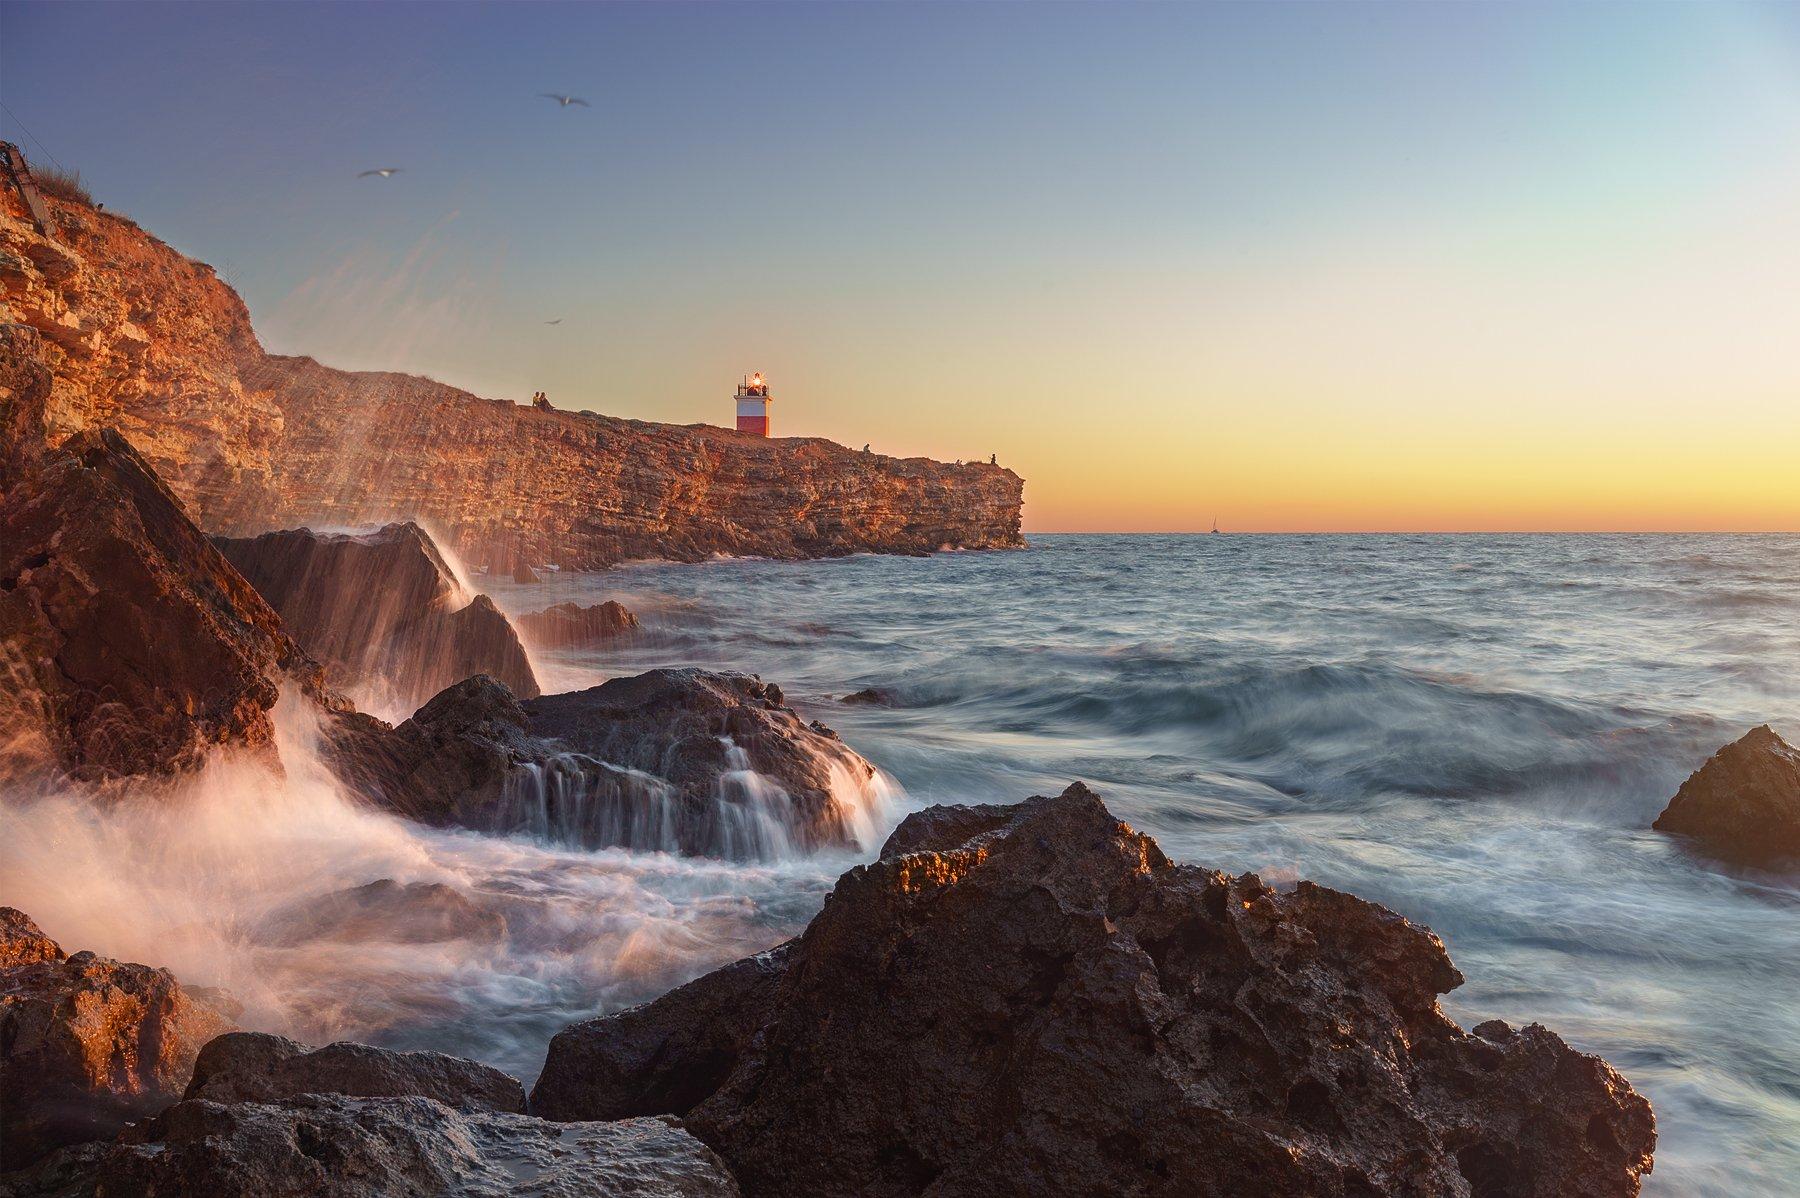 маяк, море, закат, берег, Макс